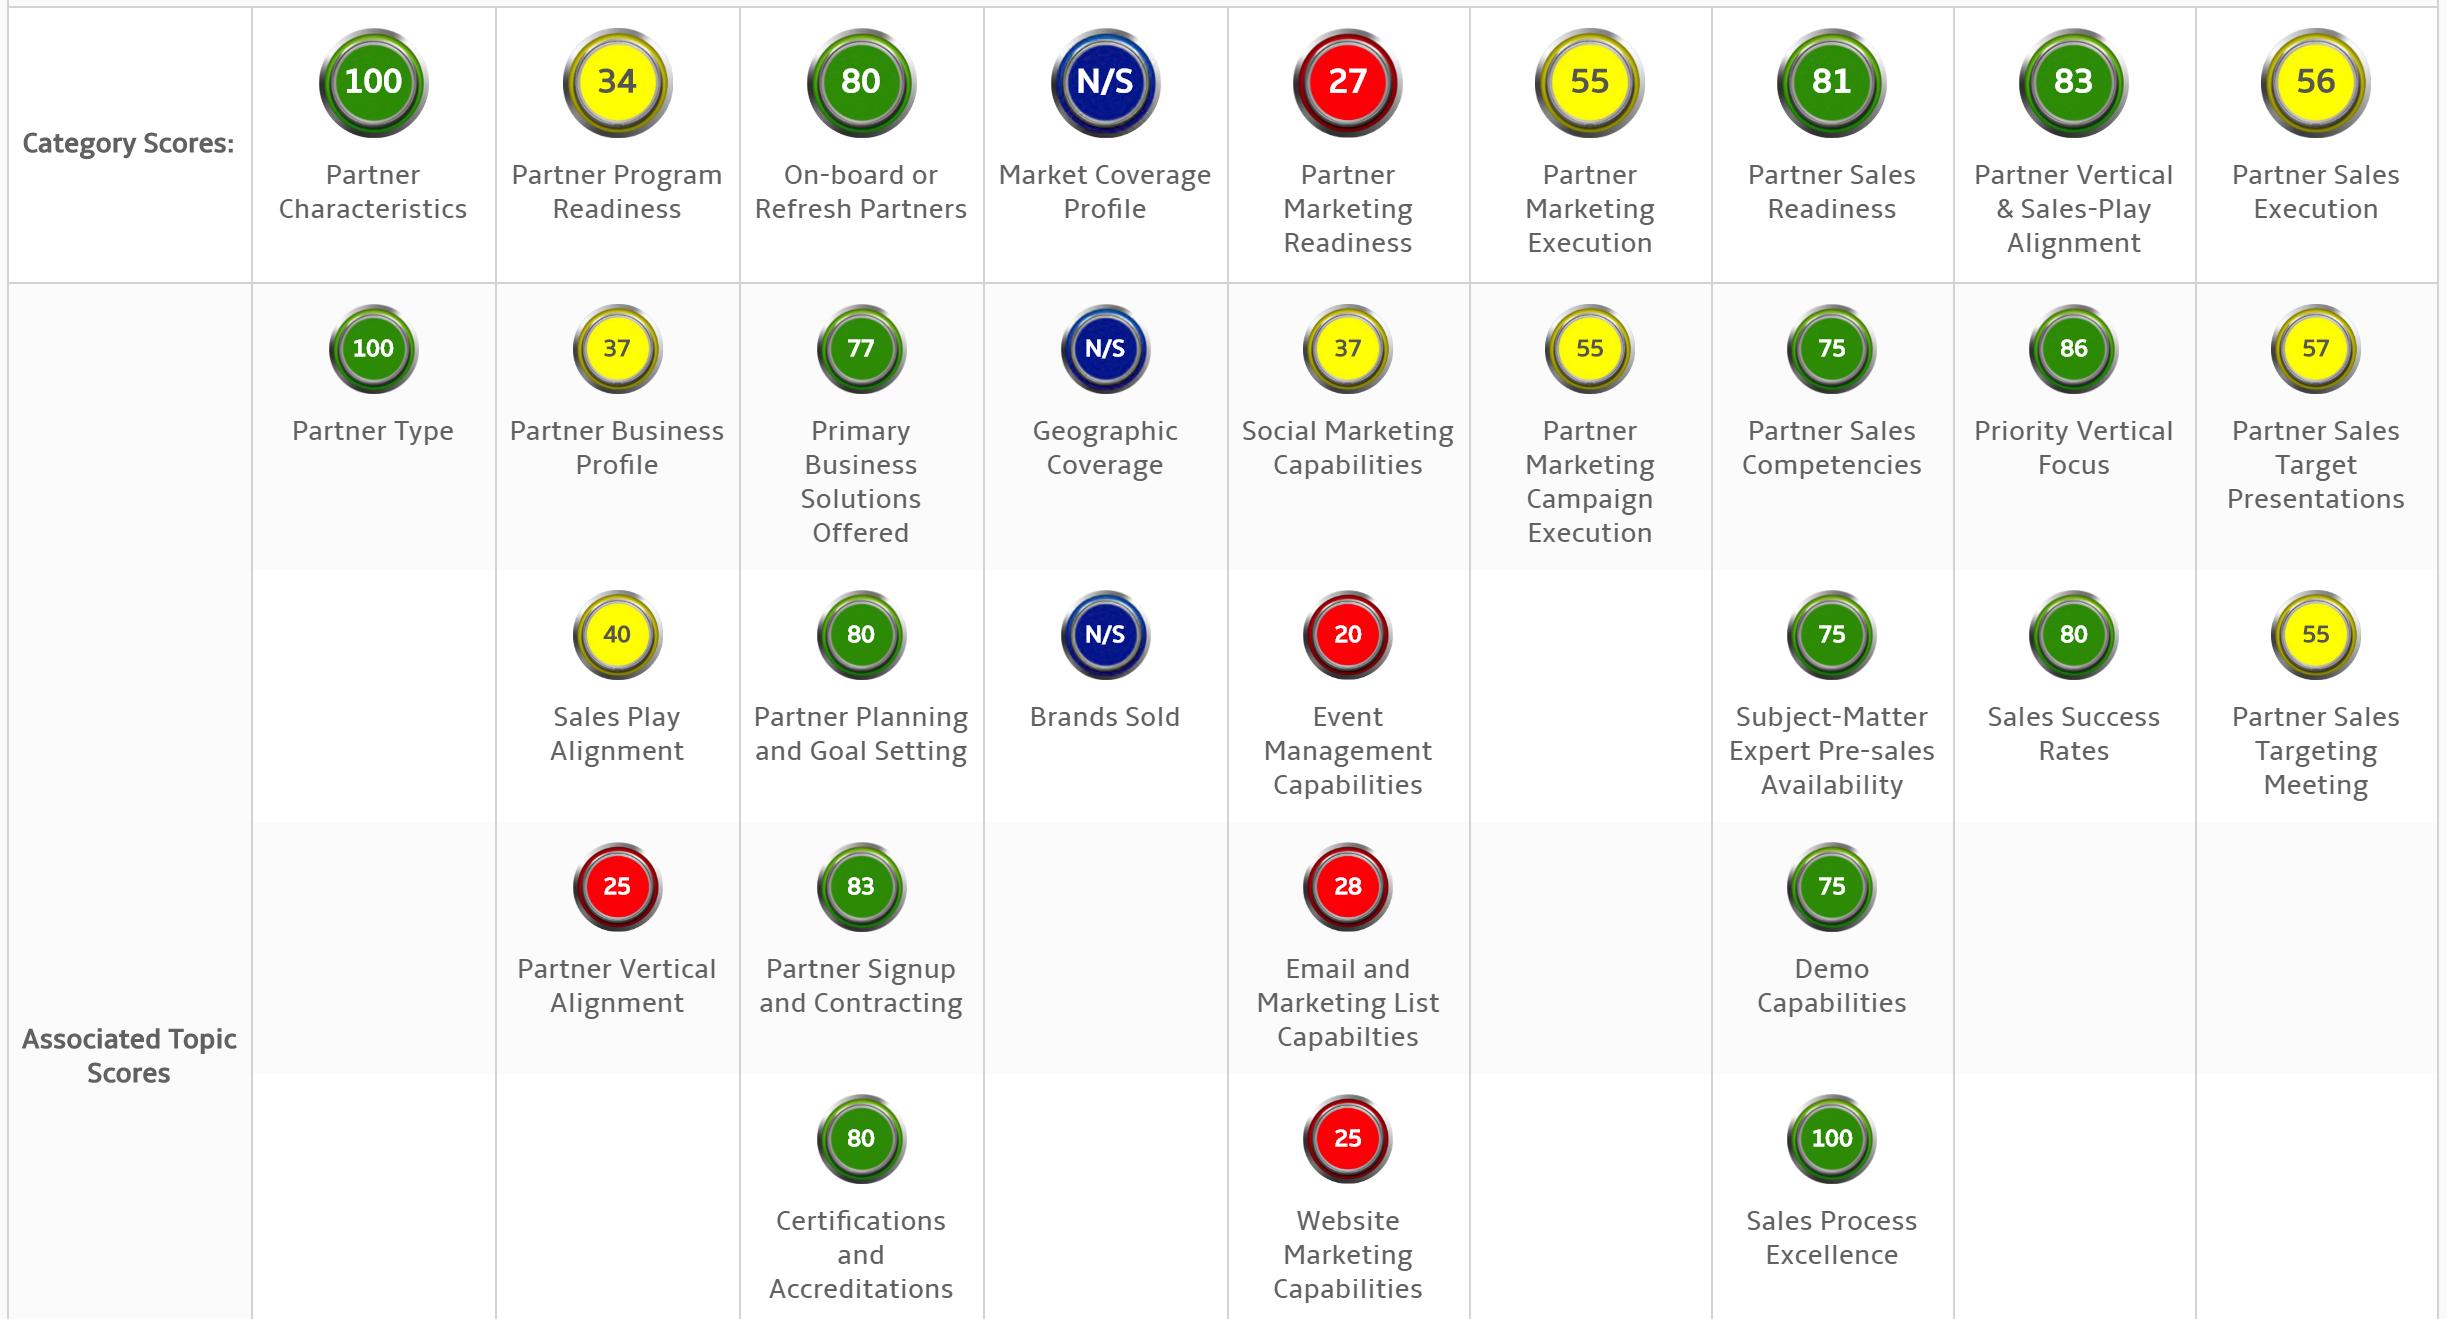 Partner Scores